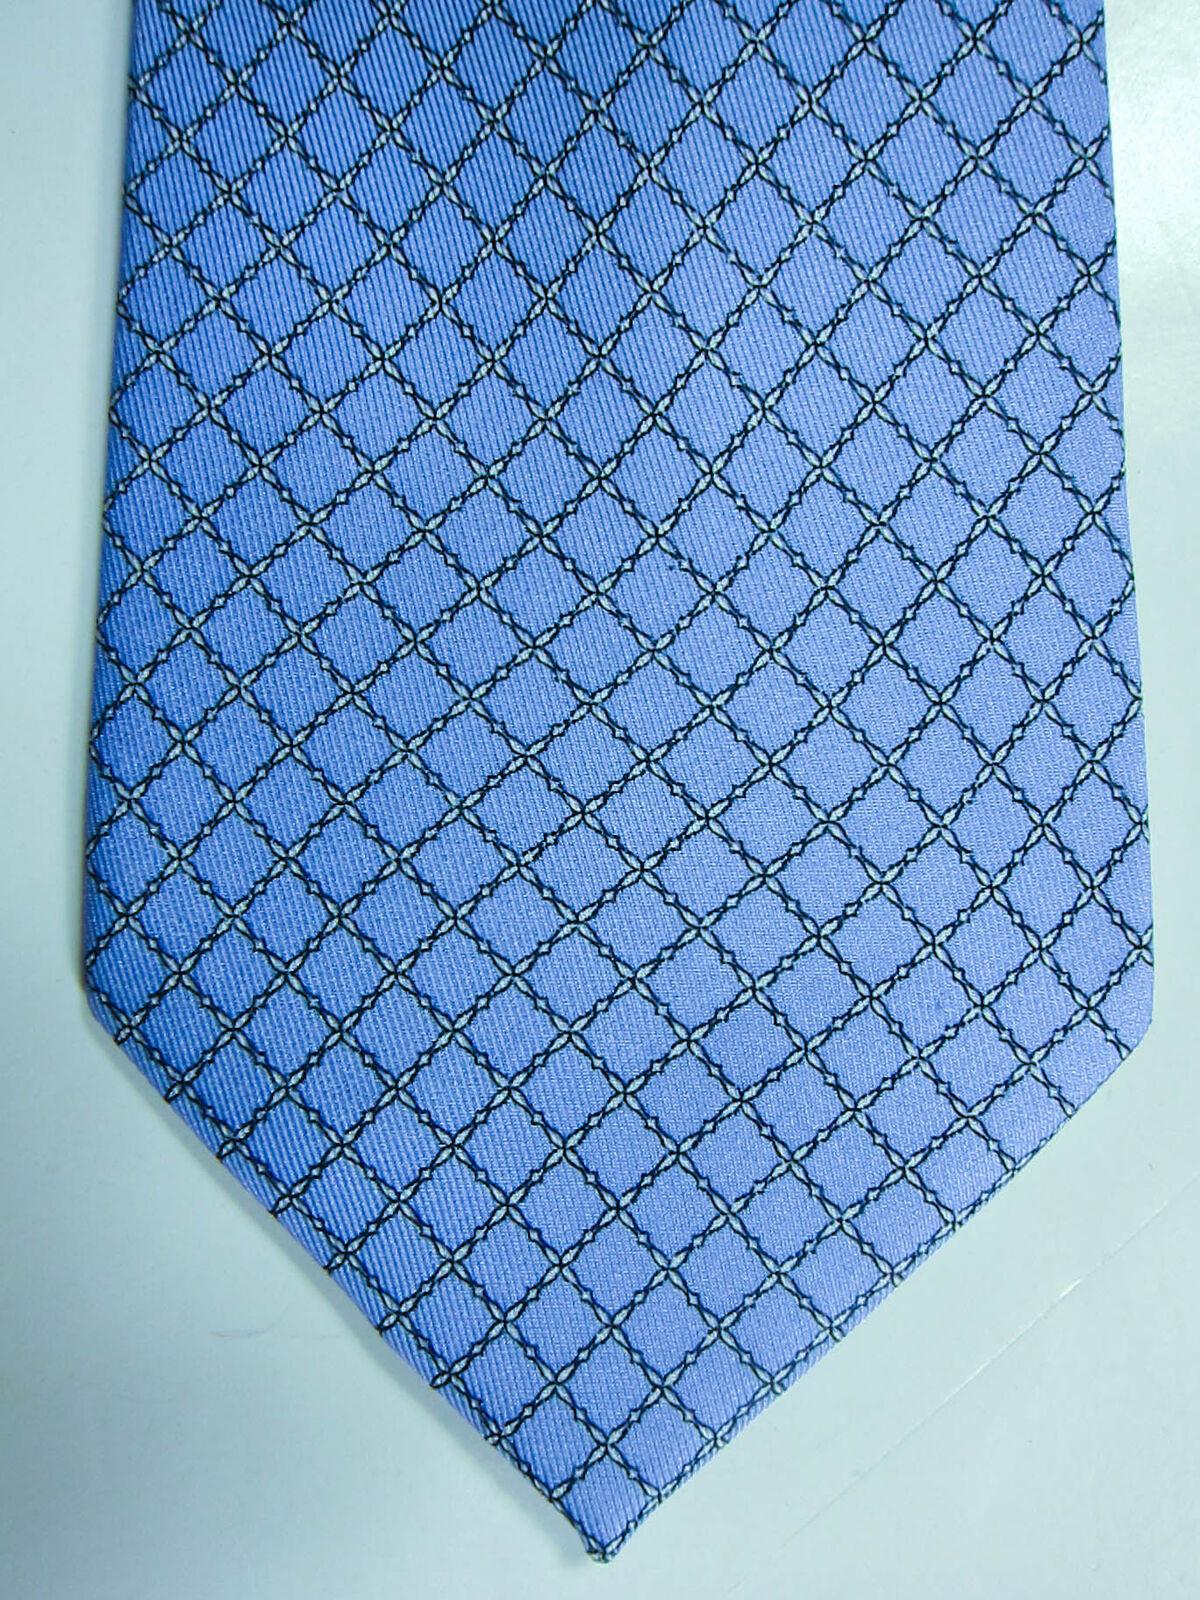 Neu J Mclaughlin Hellblau mit Weißen & Grau   Seile   Seidenkrawatte       Marke